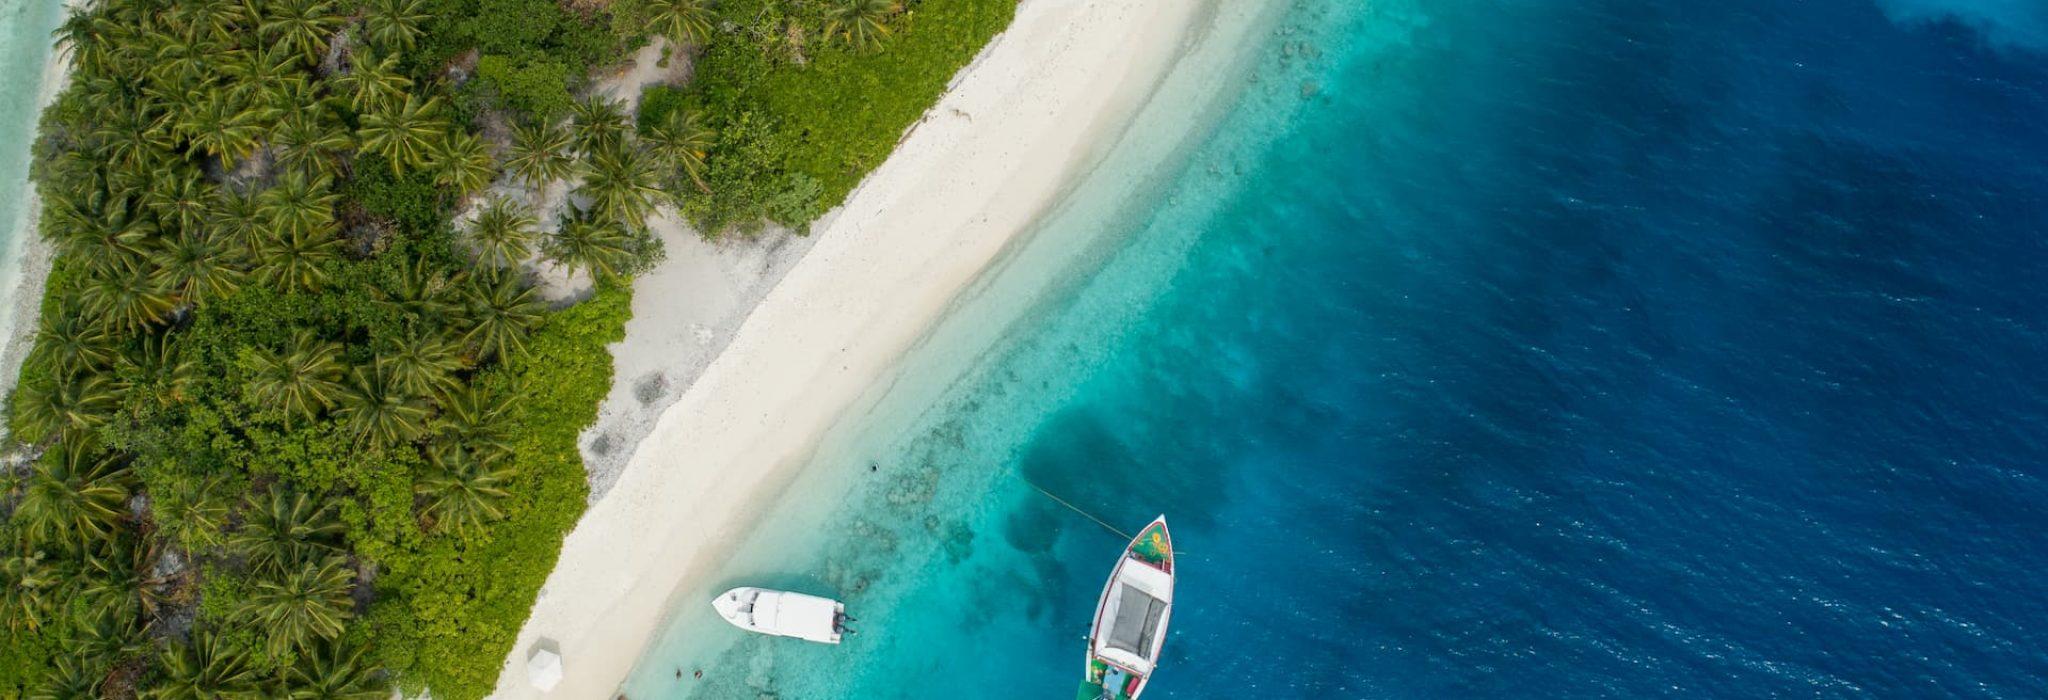 bahamas-une